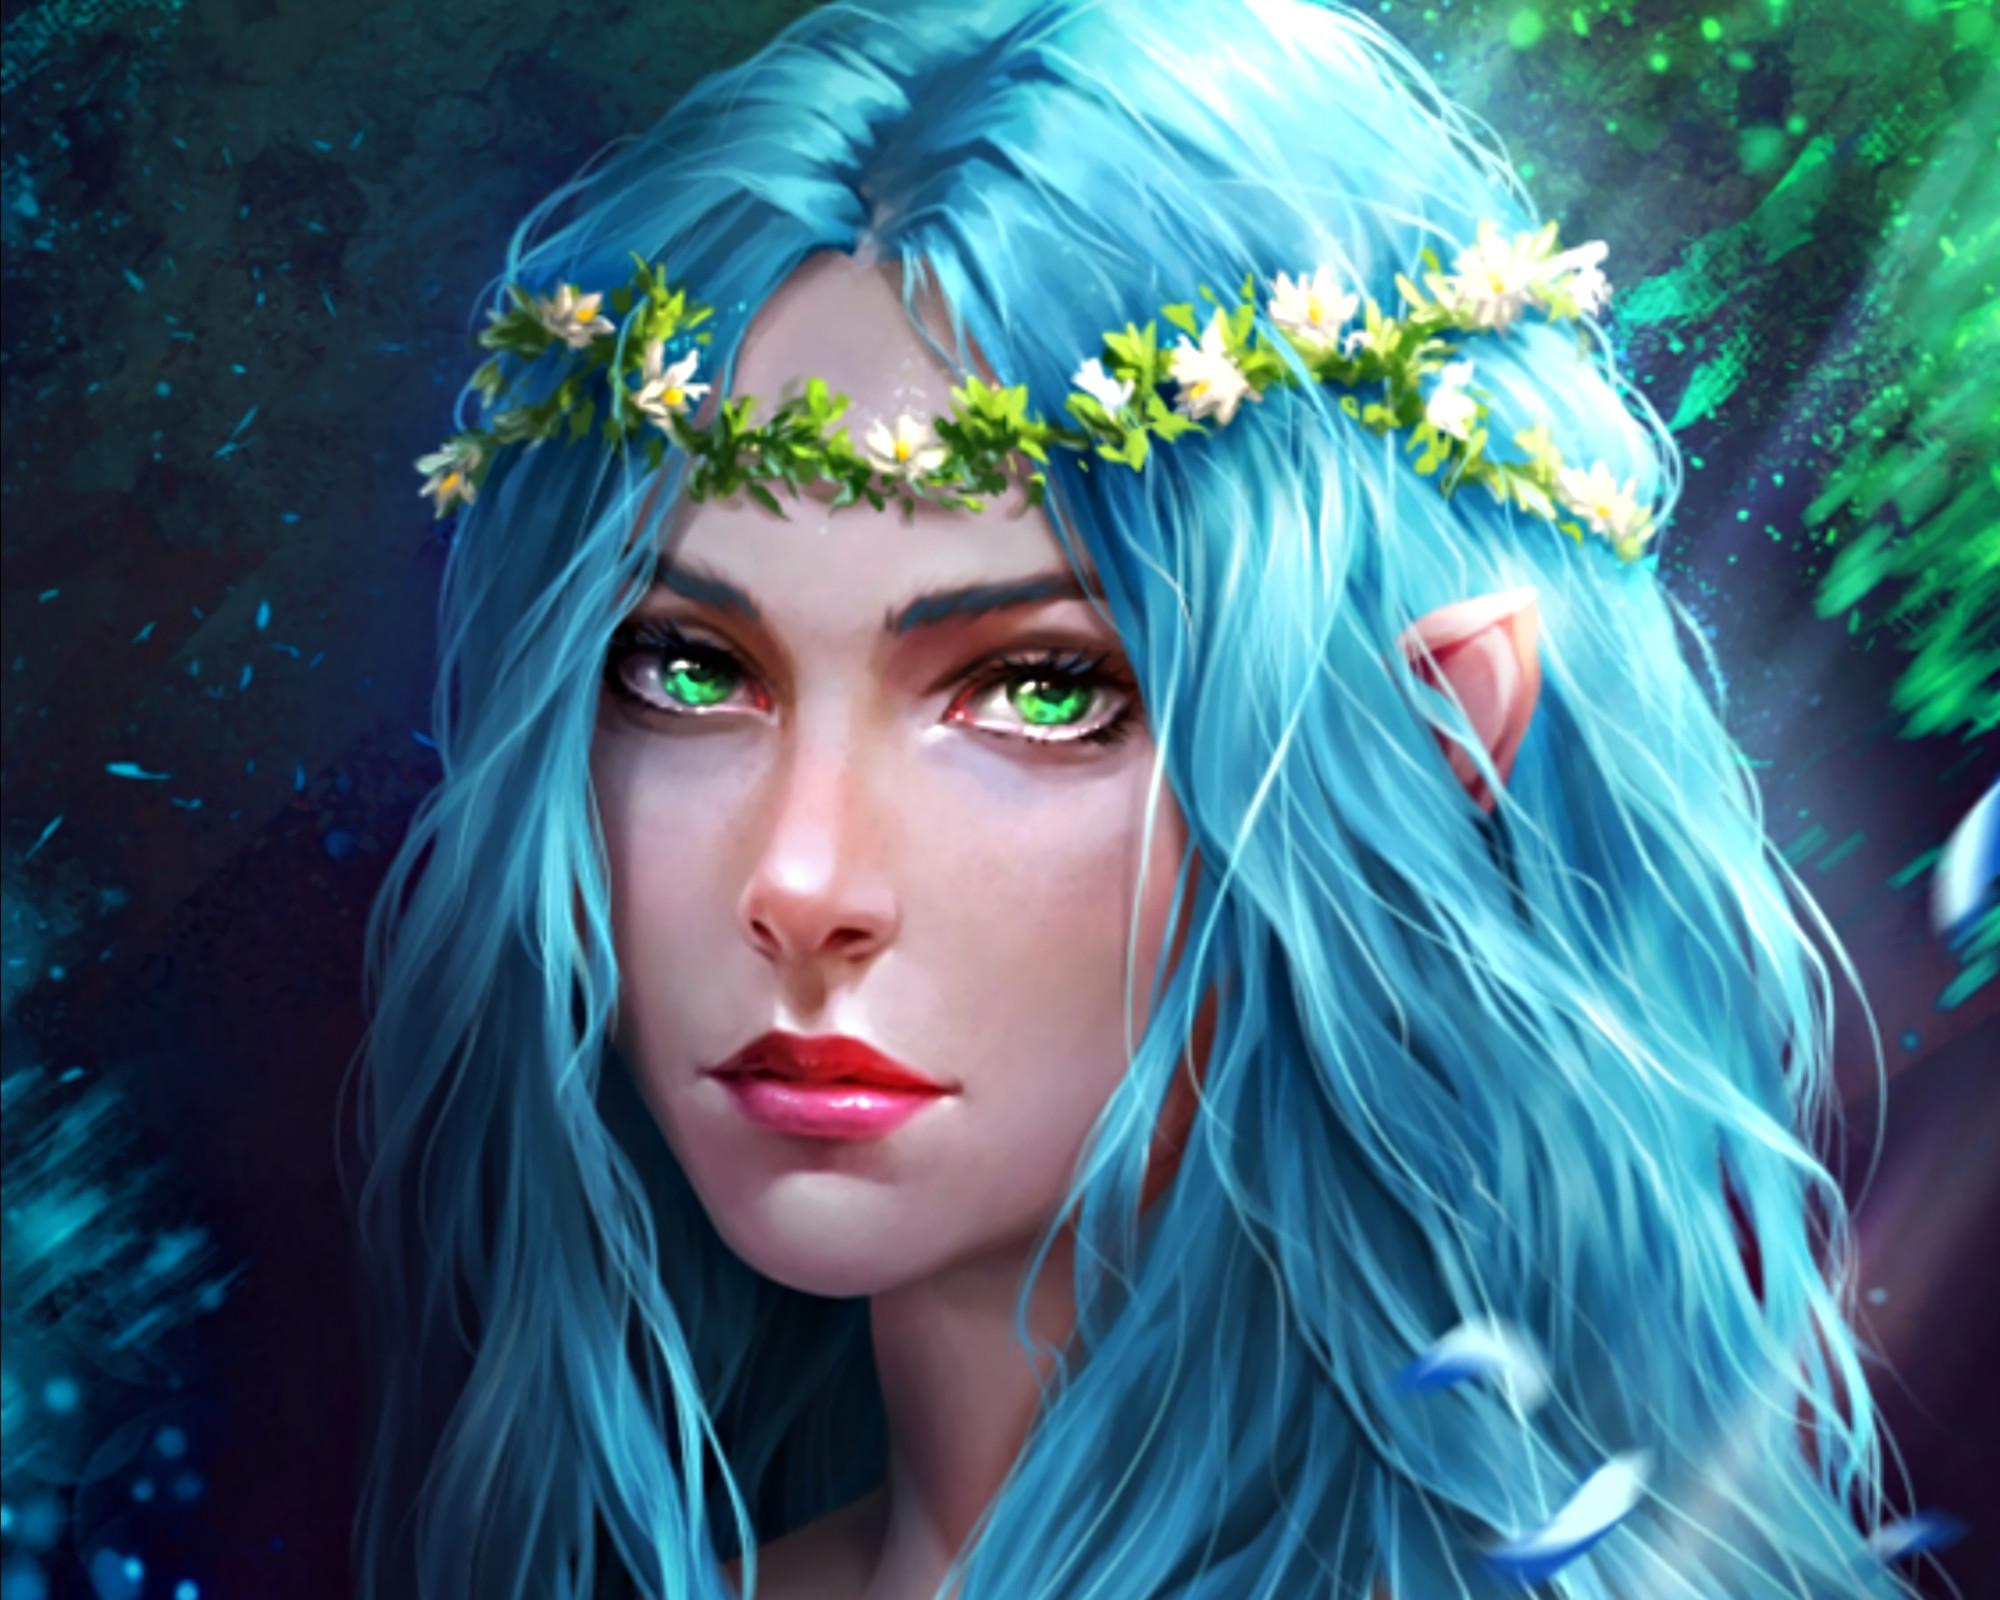 Fantasy – Elf Wreath Blue Hair Girl Woman Fantasy Green Eyes Wallpaper